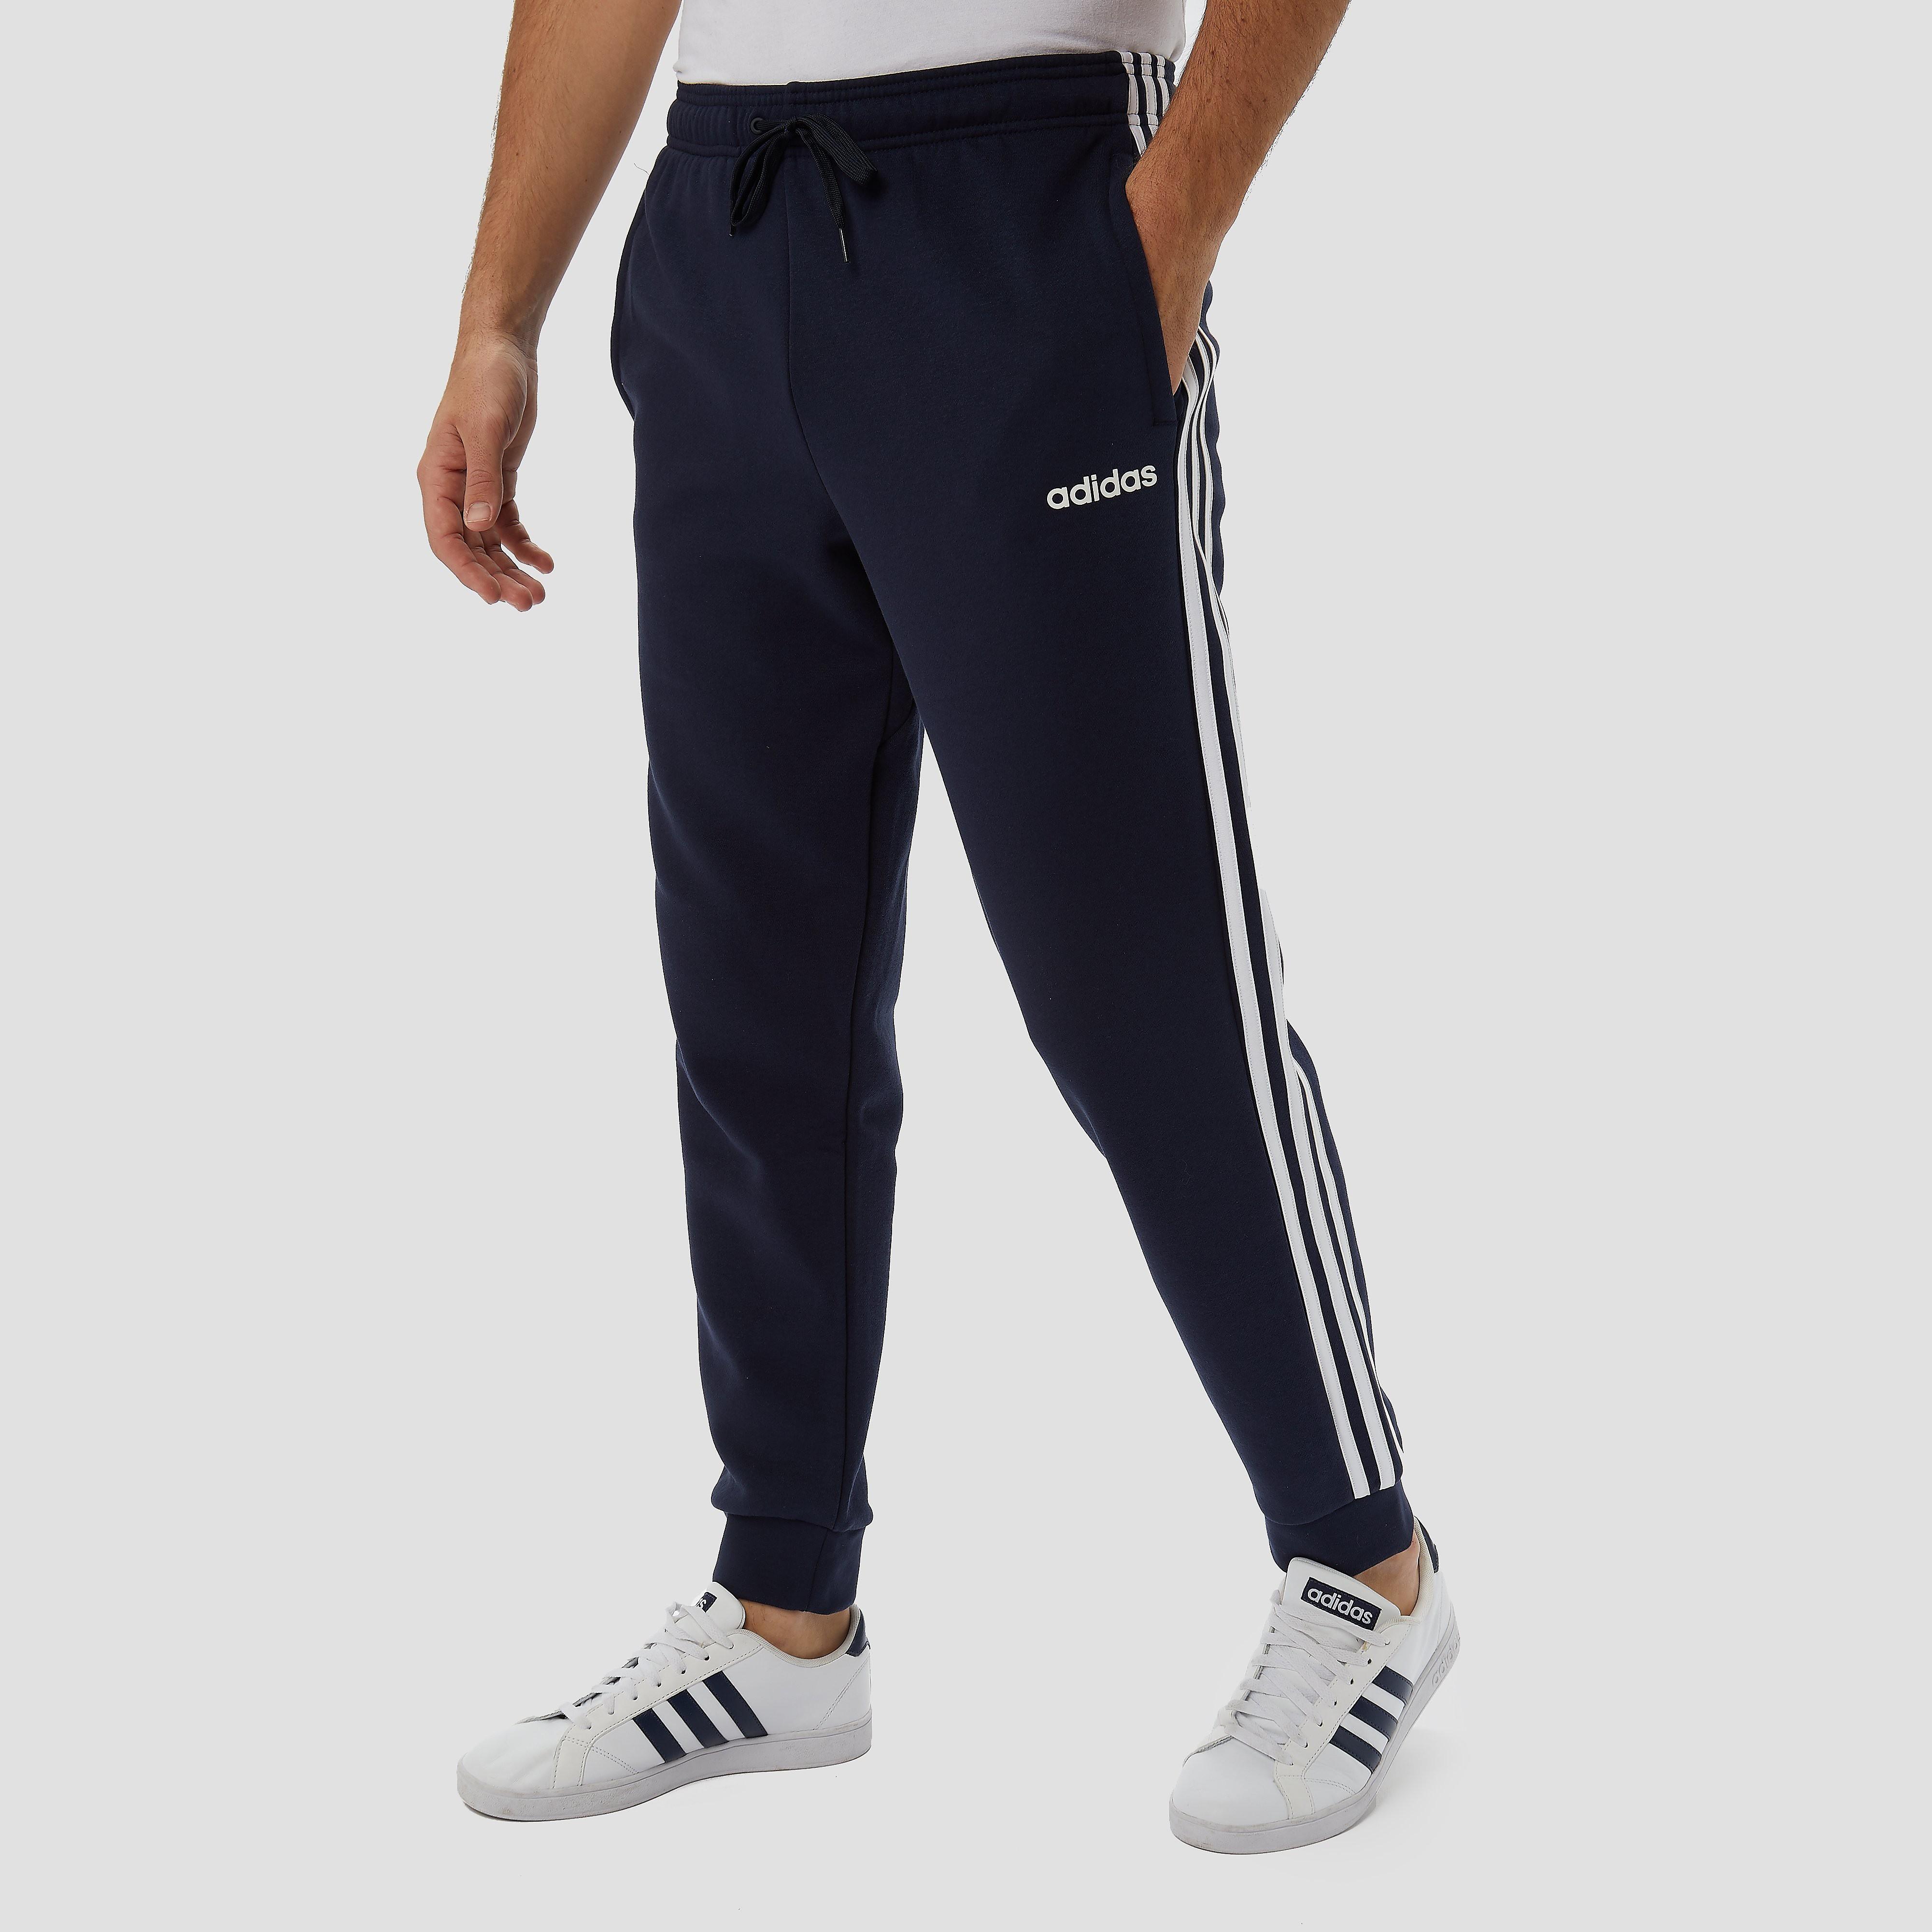 adidas trainingsbroek blauw heren